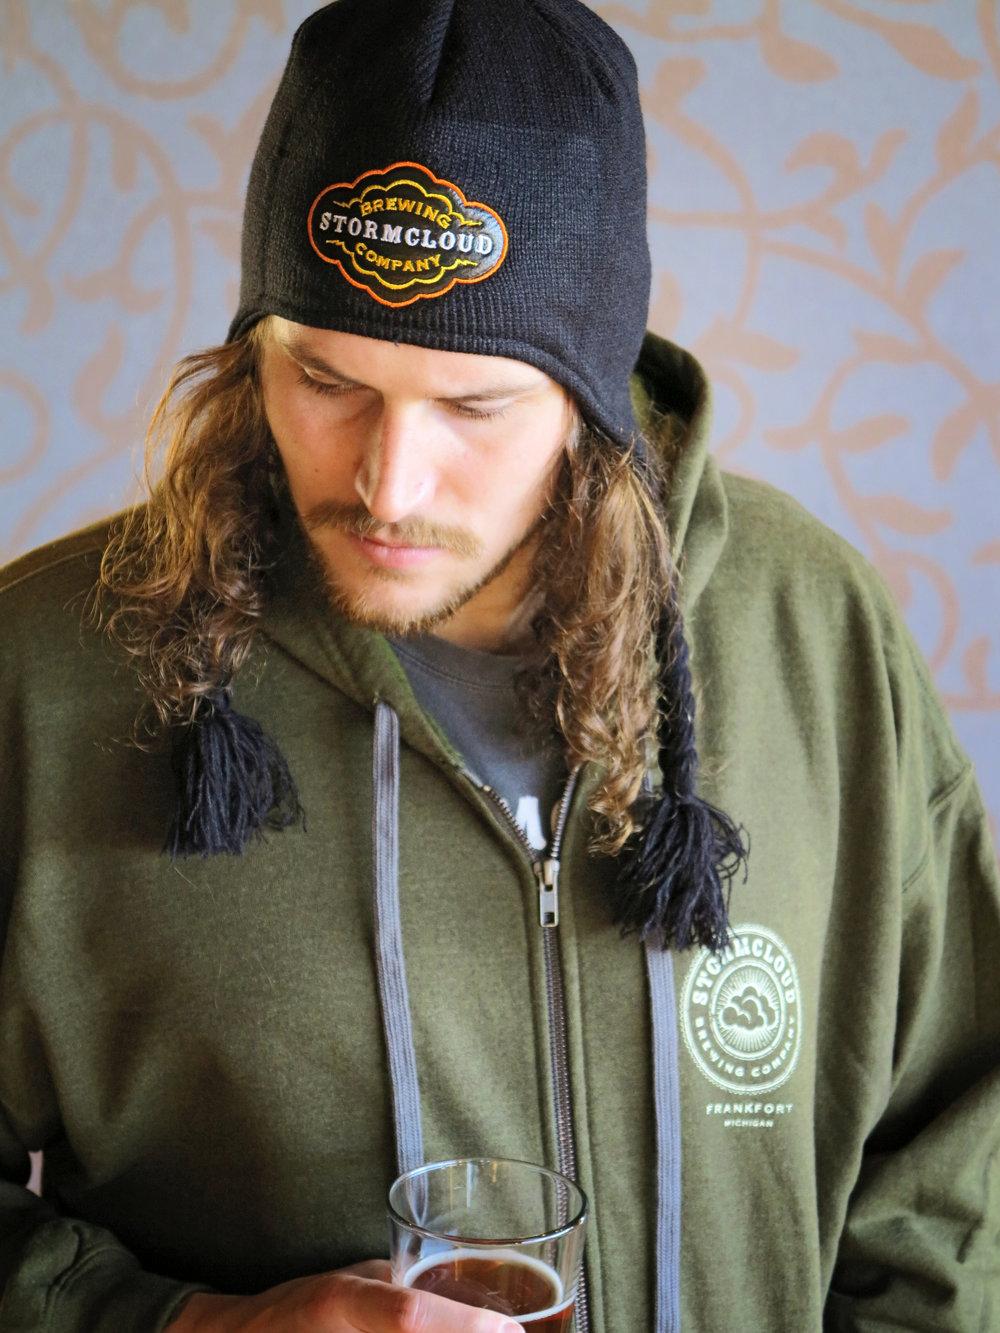 dabdefc5741 Knit Earflap Beanie — Stormcloud Brewing Company